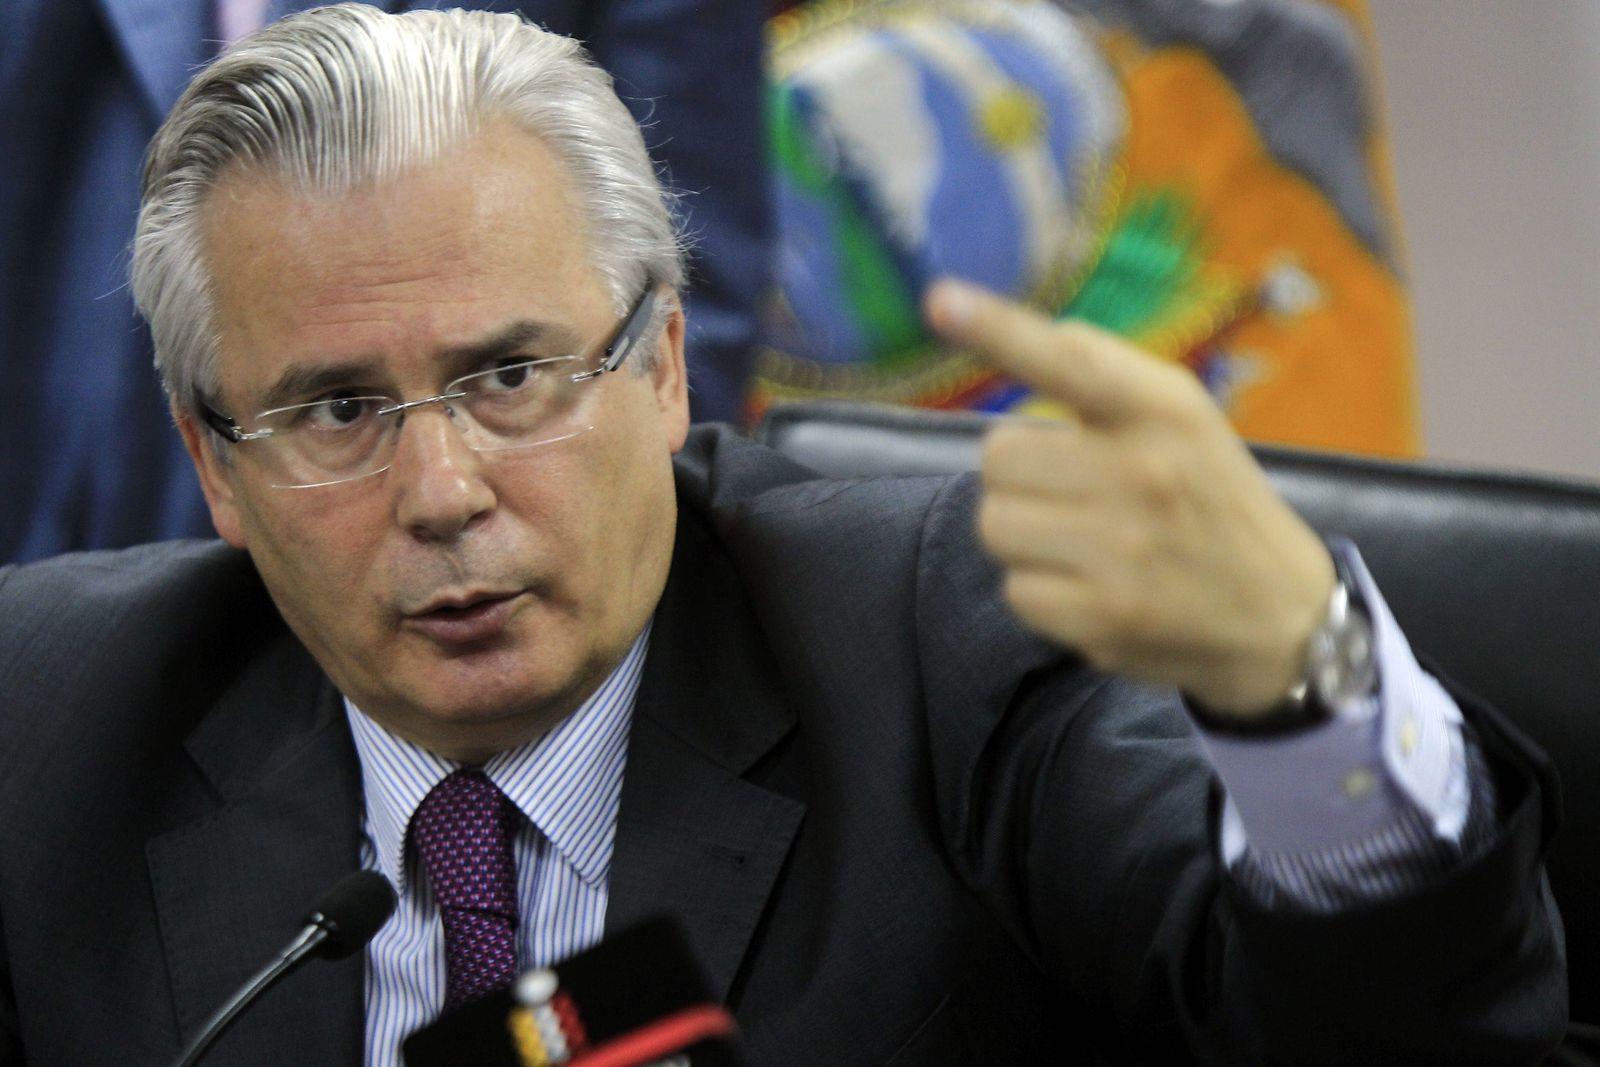 Former Spanish judge Baltasar Garzon to acts as their mediator